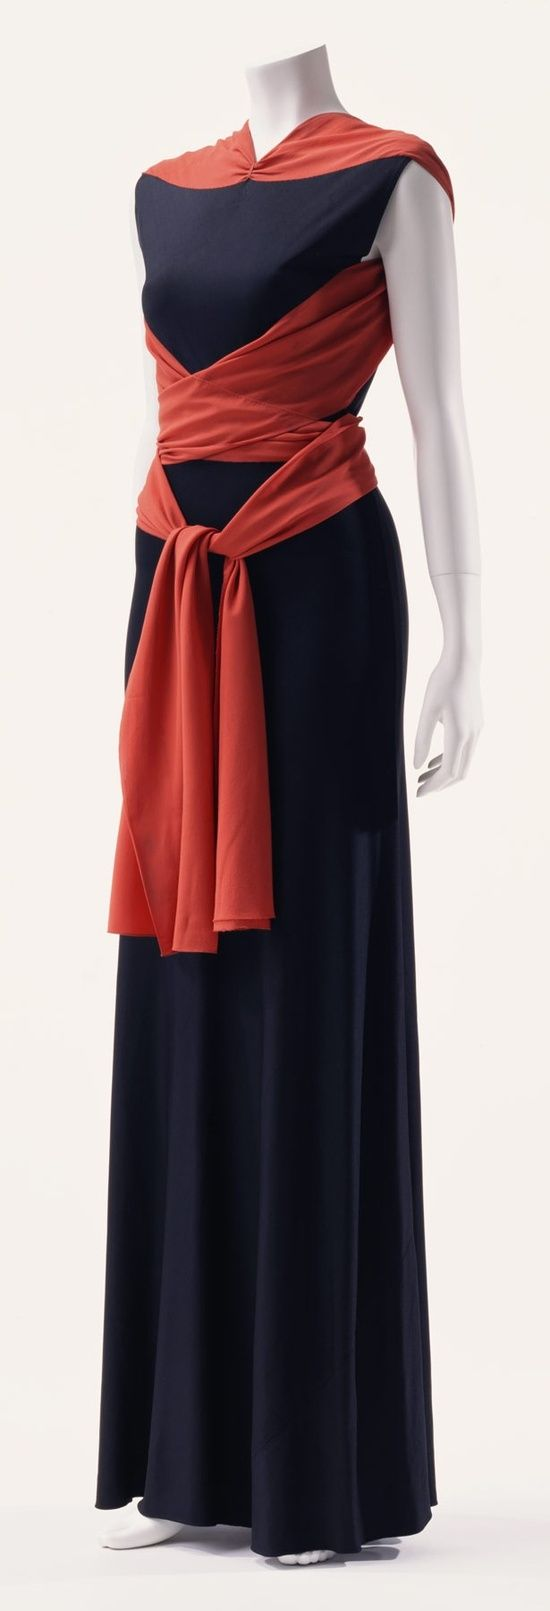 Vionnet Dress - c- 1933 - by Madeleine Vionnet, France - Black rayon jersey one-piece dress; vermillion silk crepe sash; bias cut -